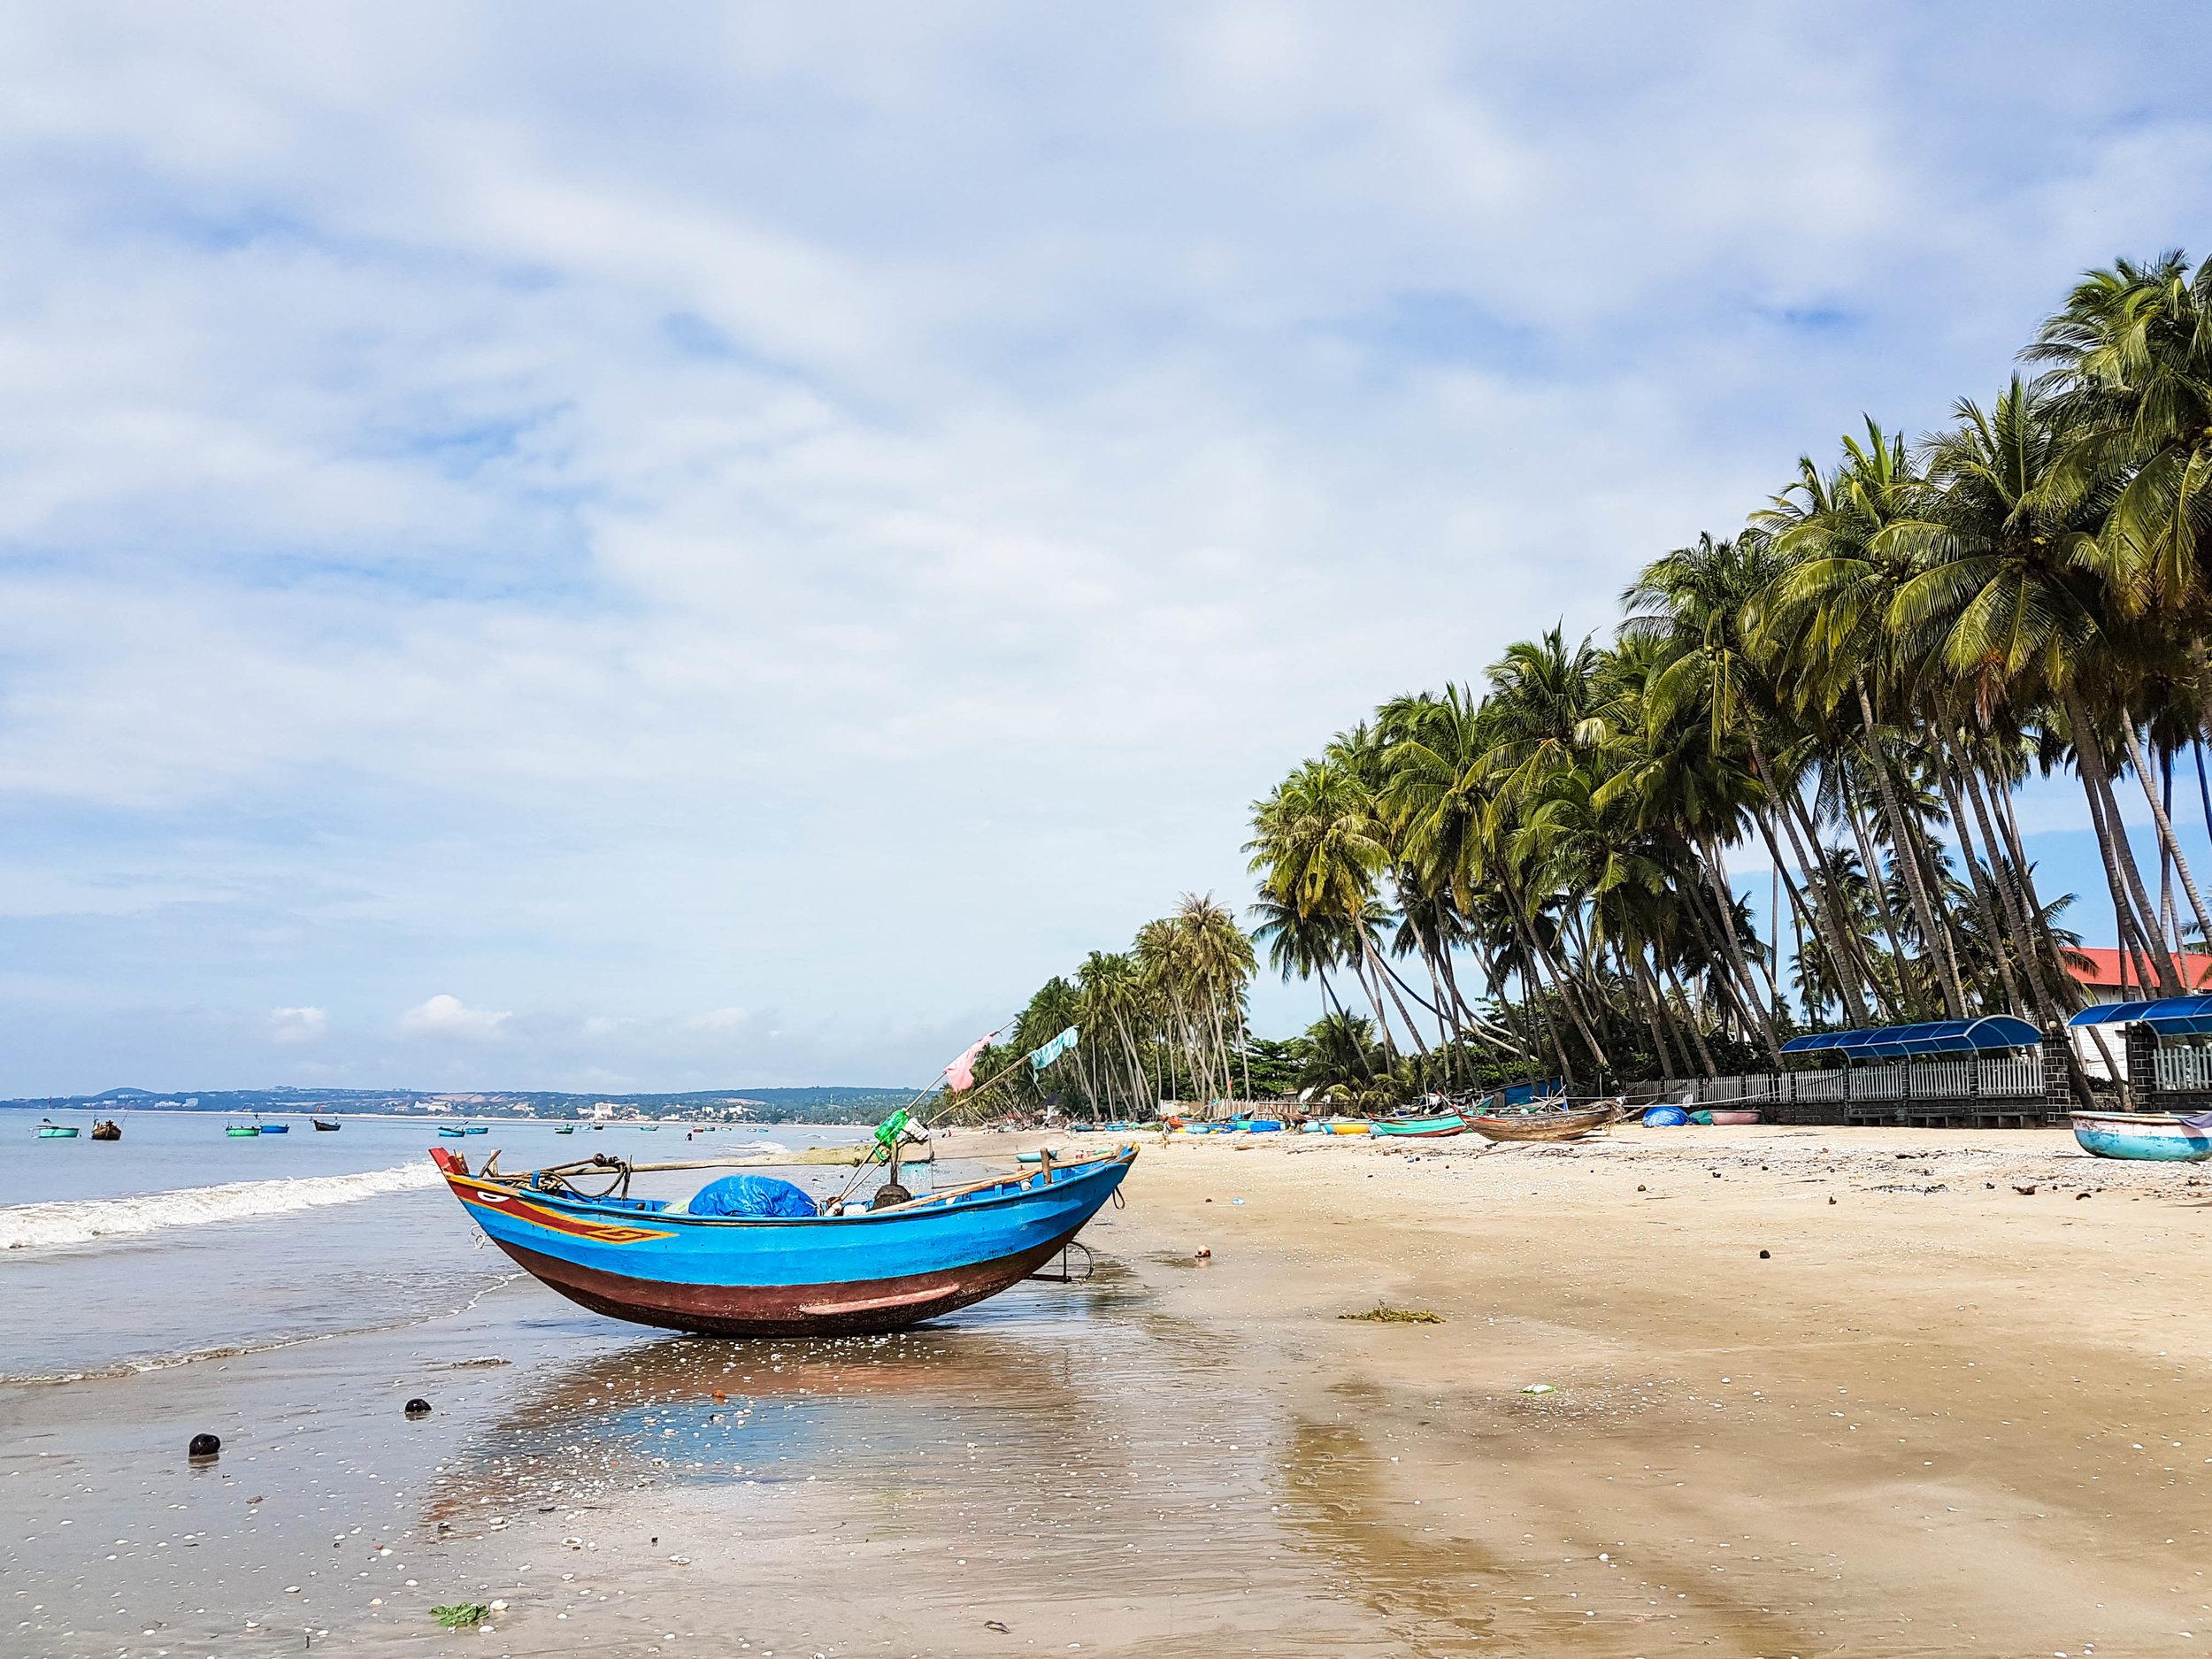 A fisherman's boat lies on the sandy beach of Mui Ne